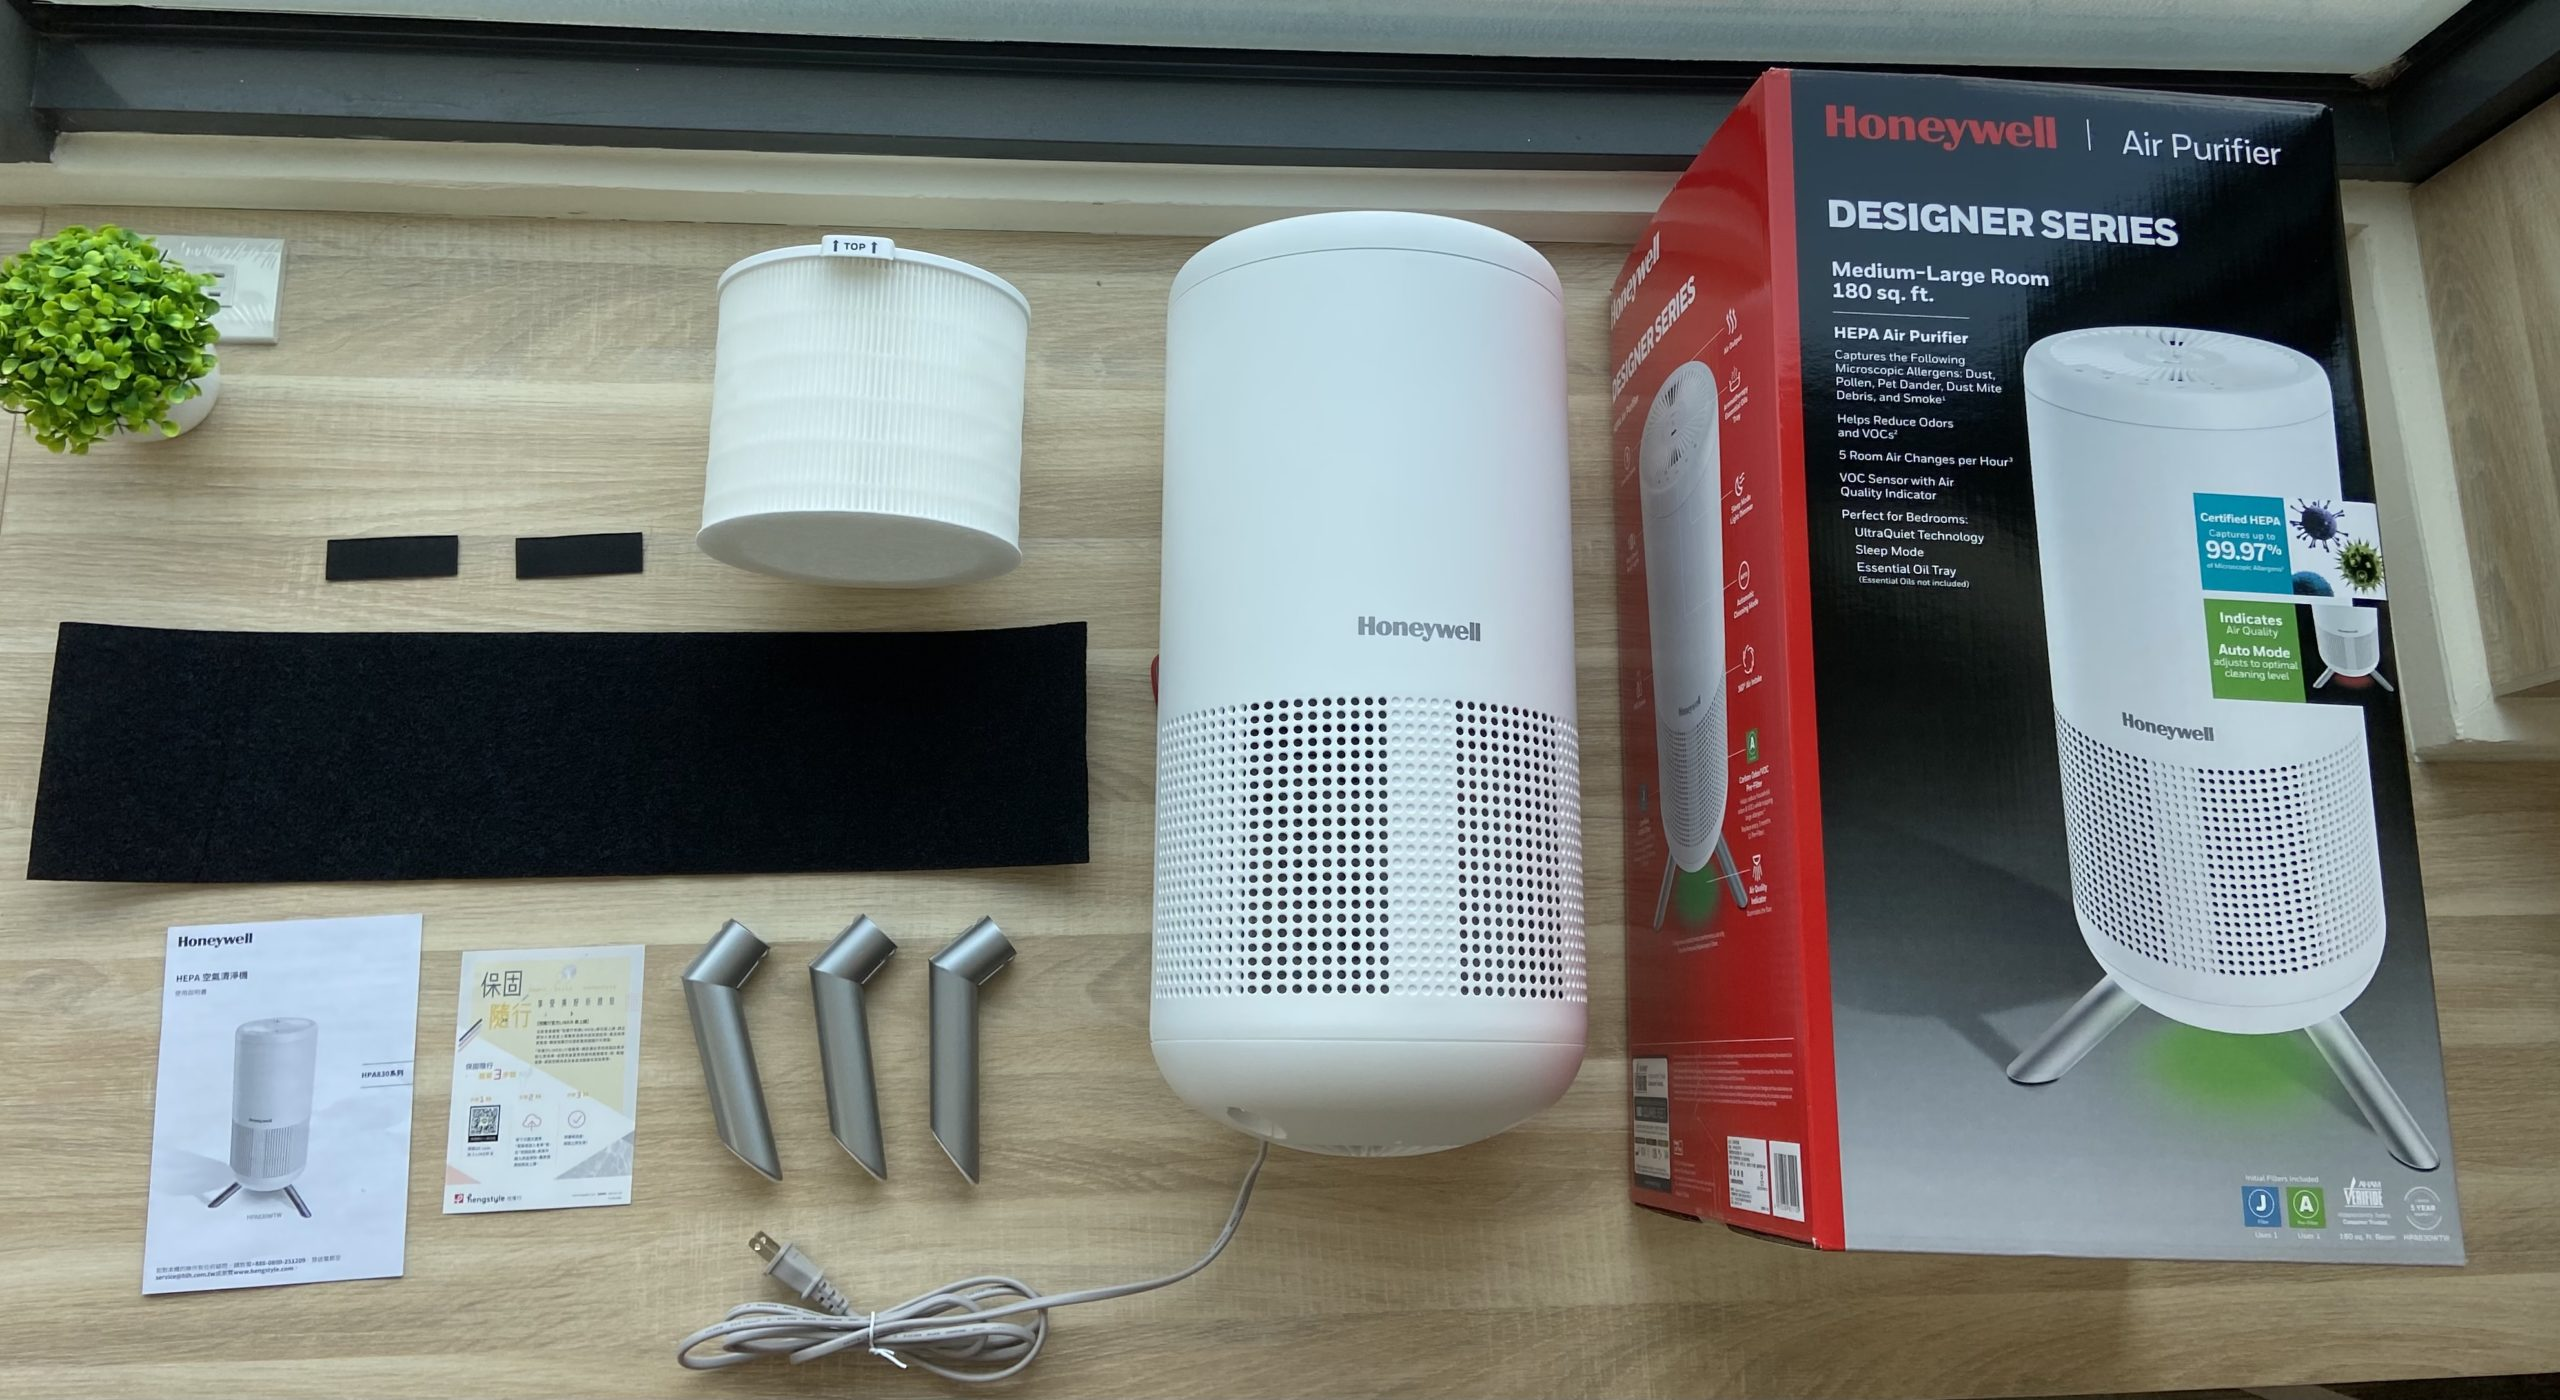 Honeywell HPA 830 淨香氛空氣清淨機 配件檢查